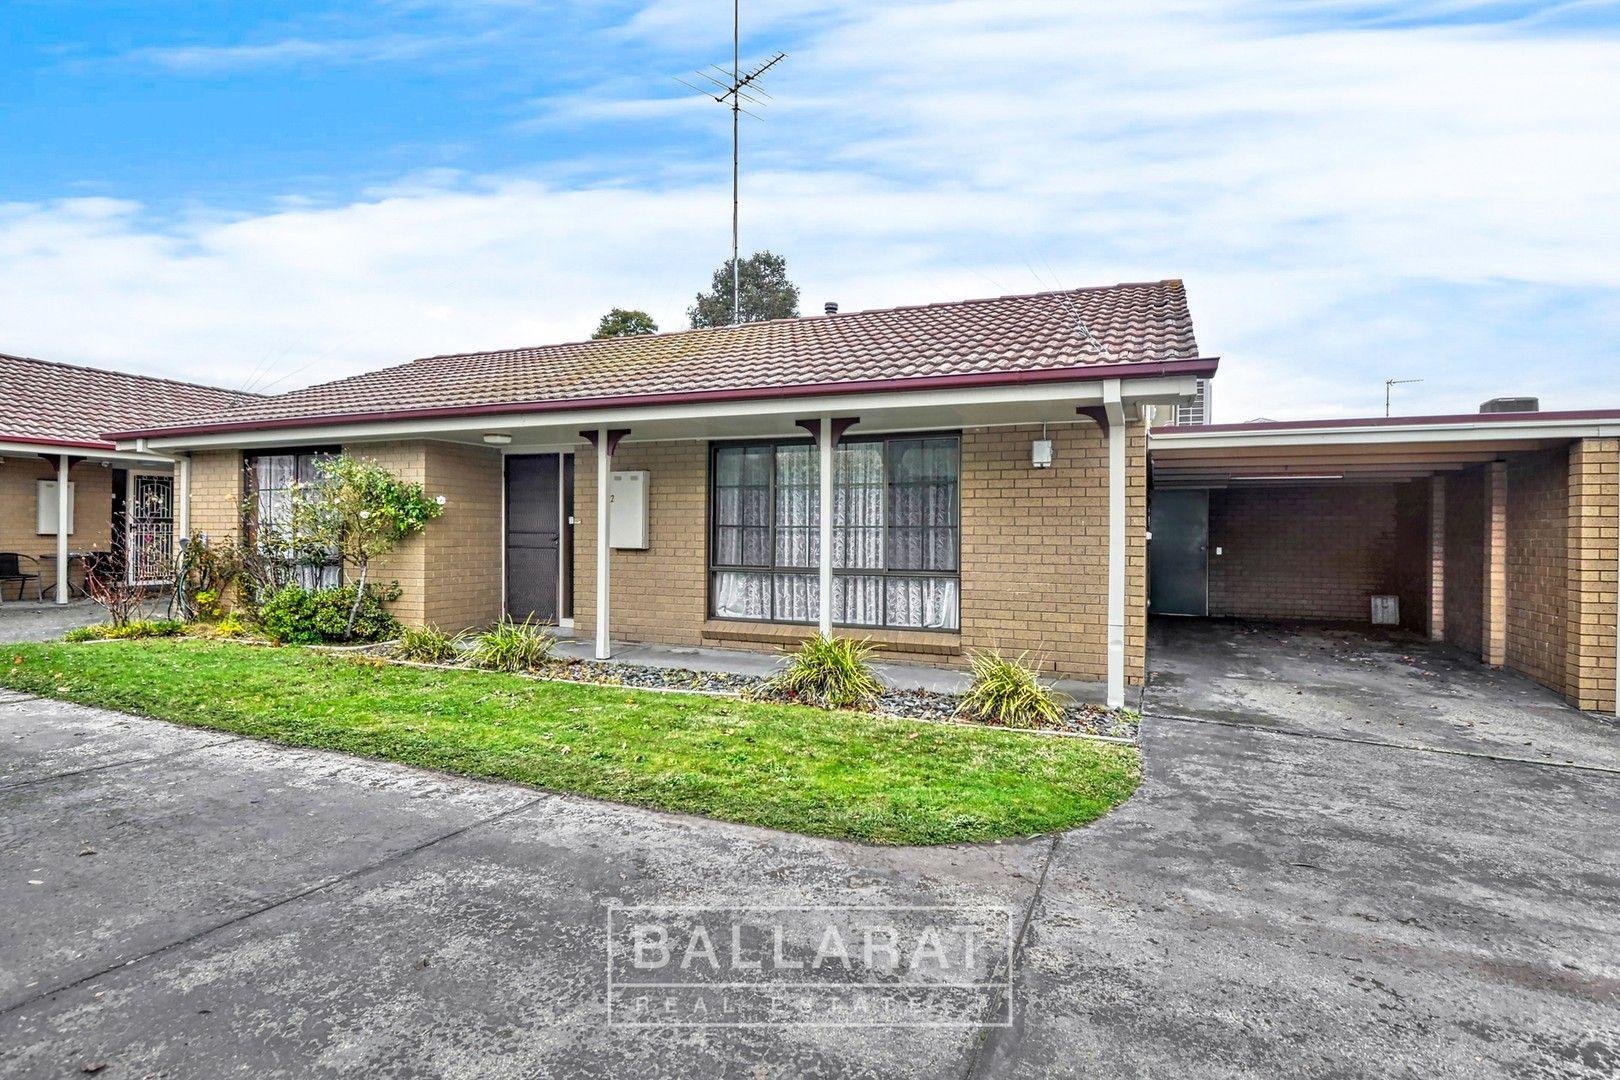 2/205 Ripon Street South, Ballarat Central VIC 3350